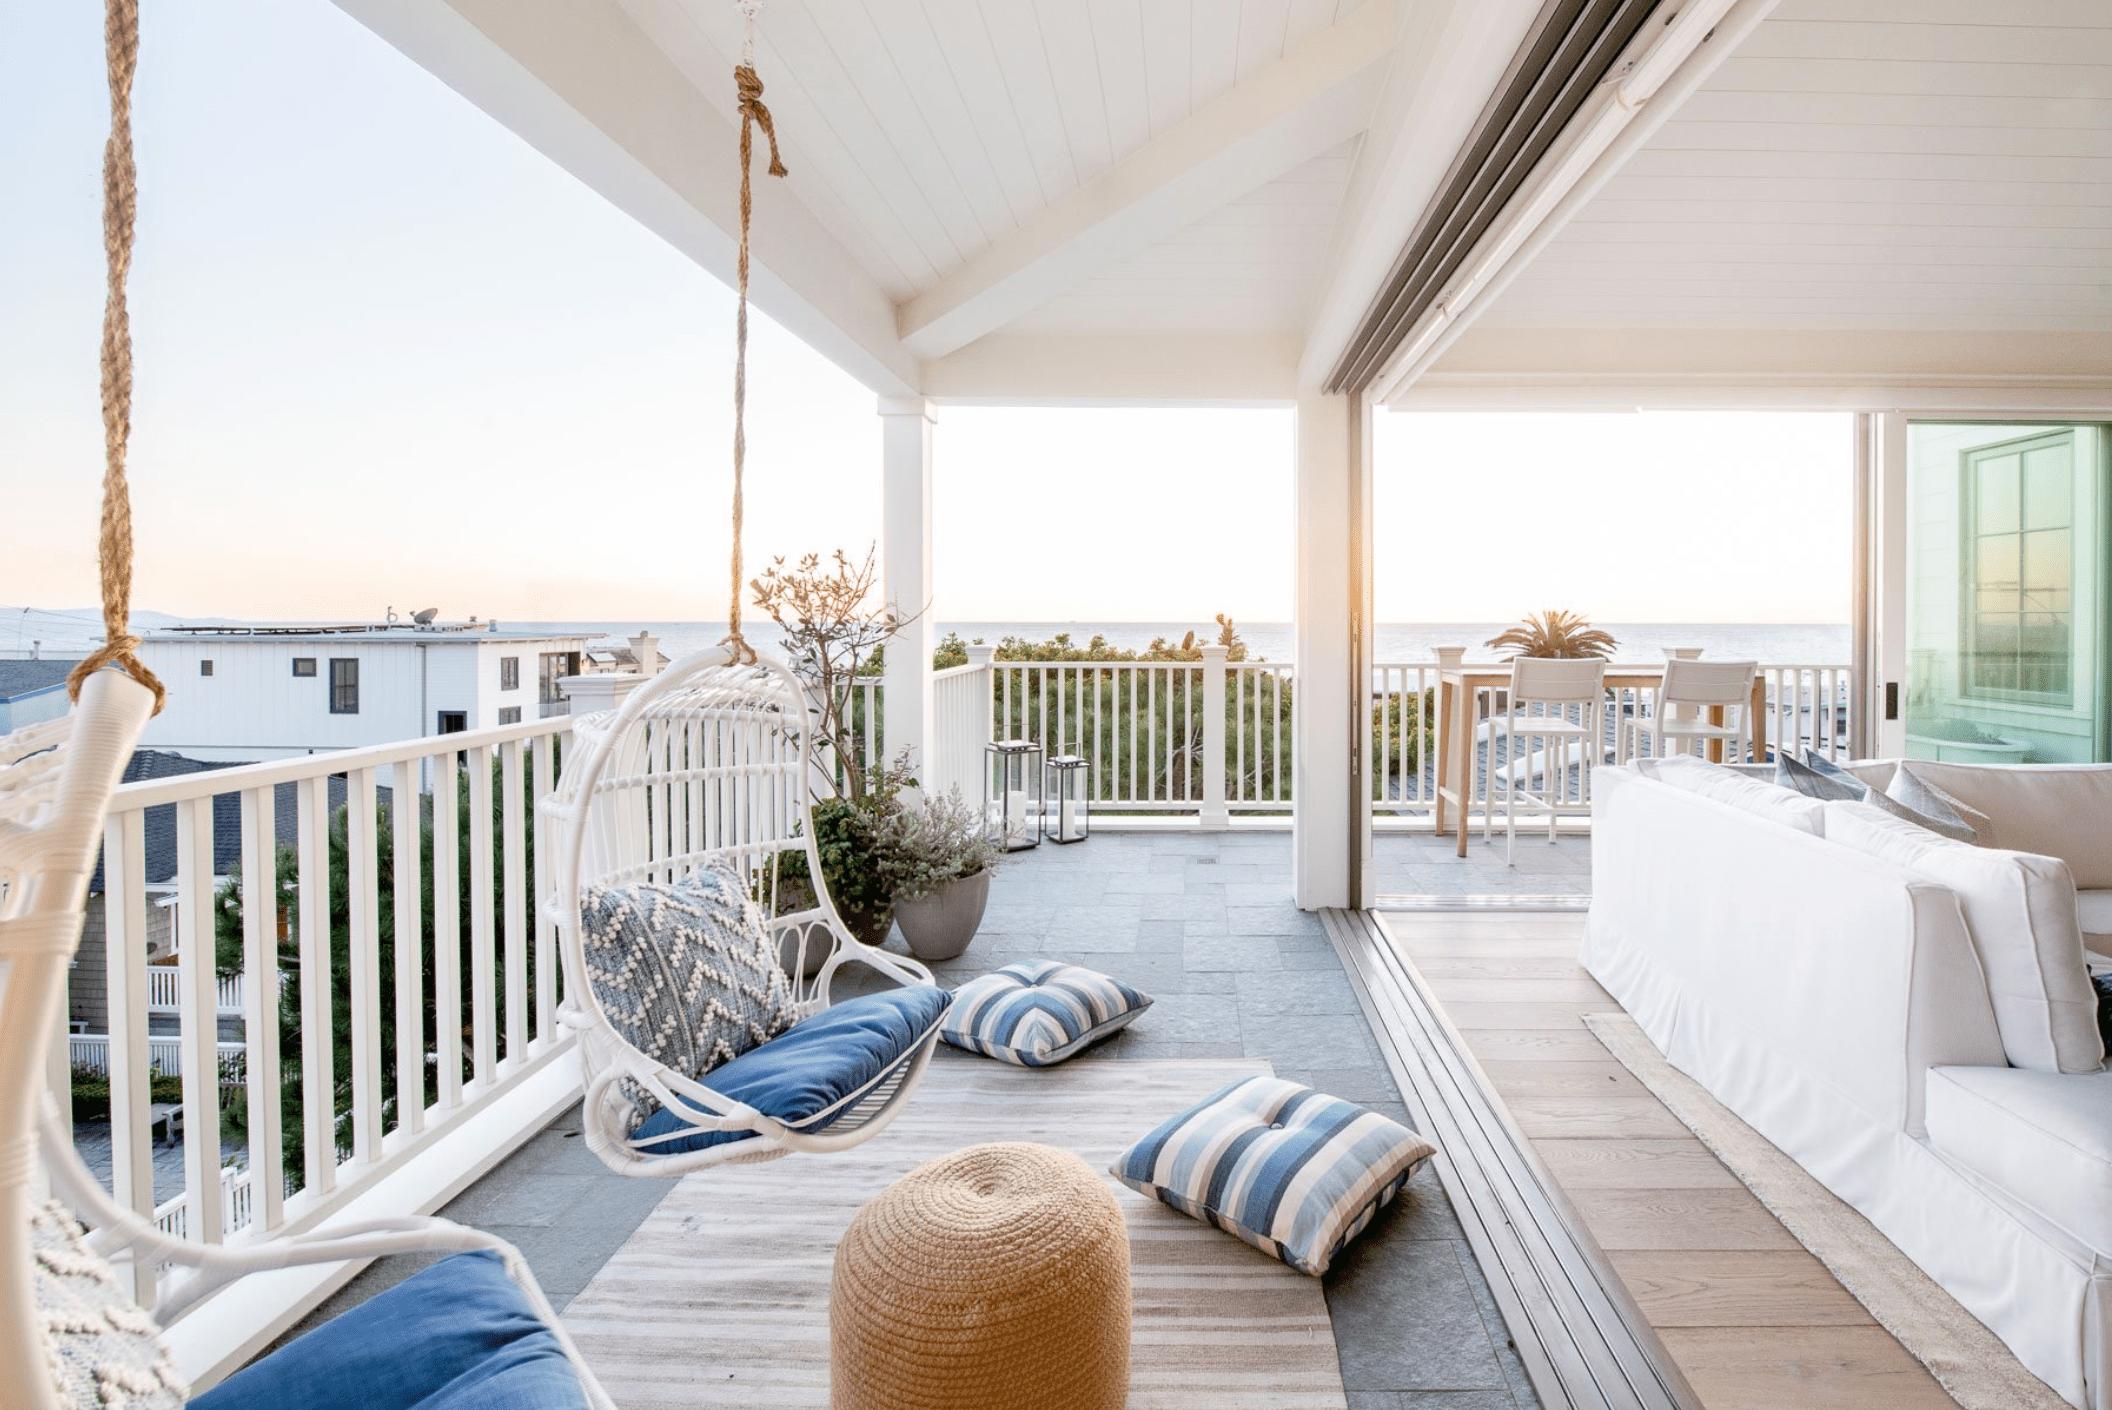 White Sands Design + Build